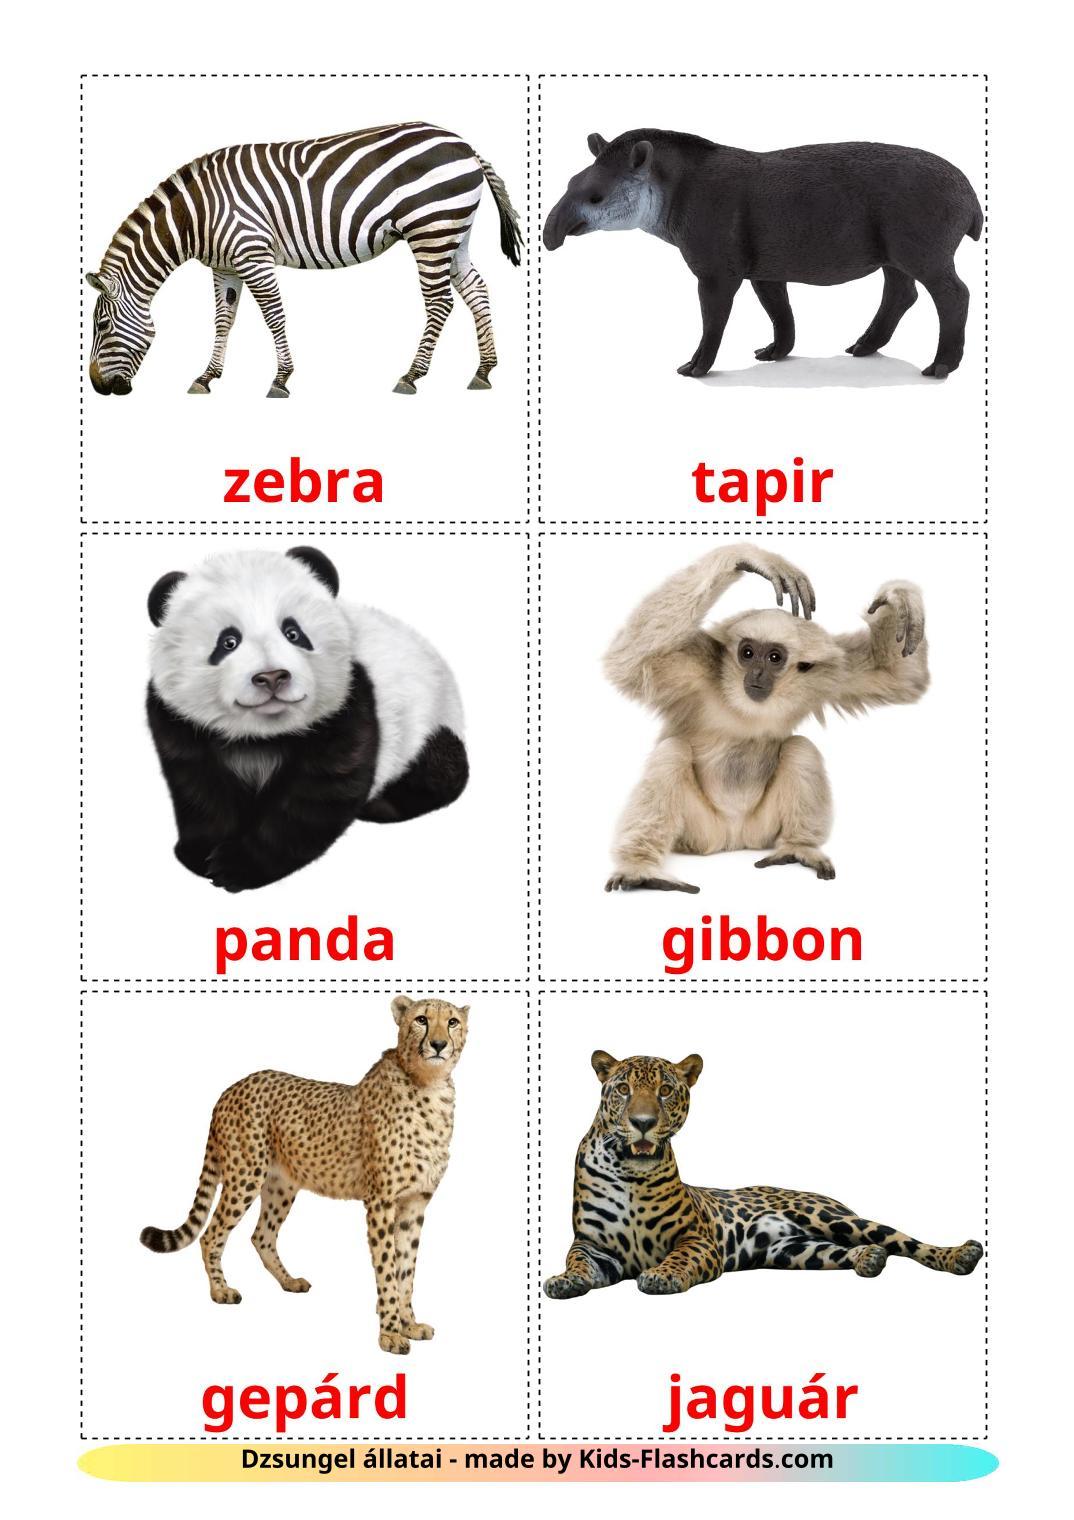 Jungle animals - 21 Free Printable hungarian Flashcards